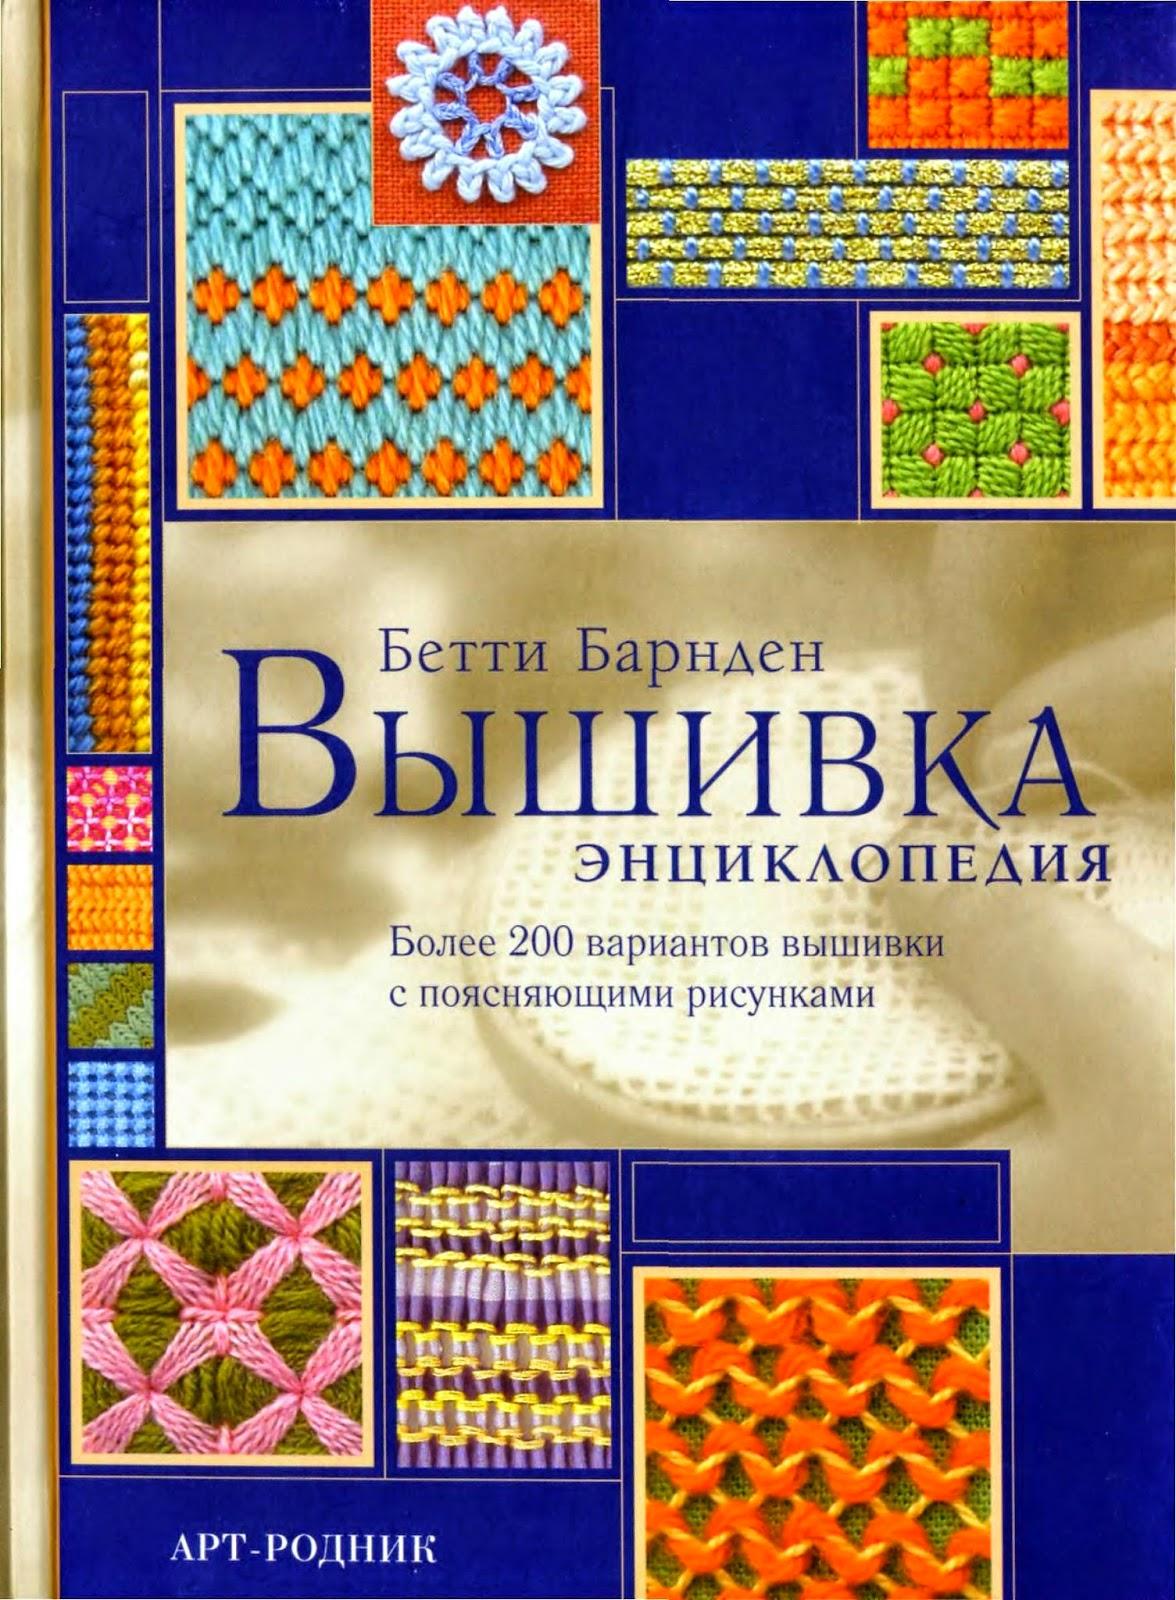 http://dfiles.ru/files/tg46j6jro